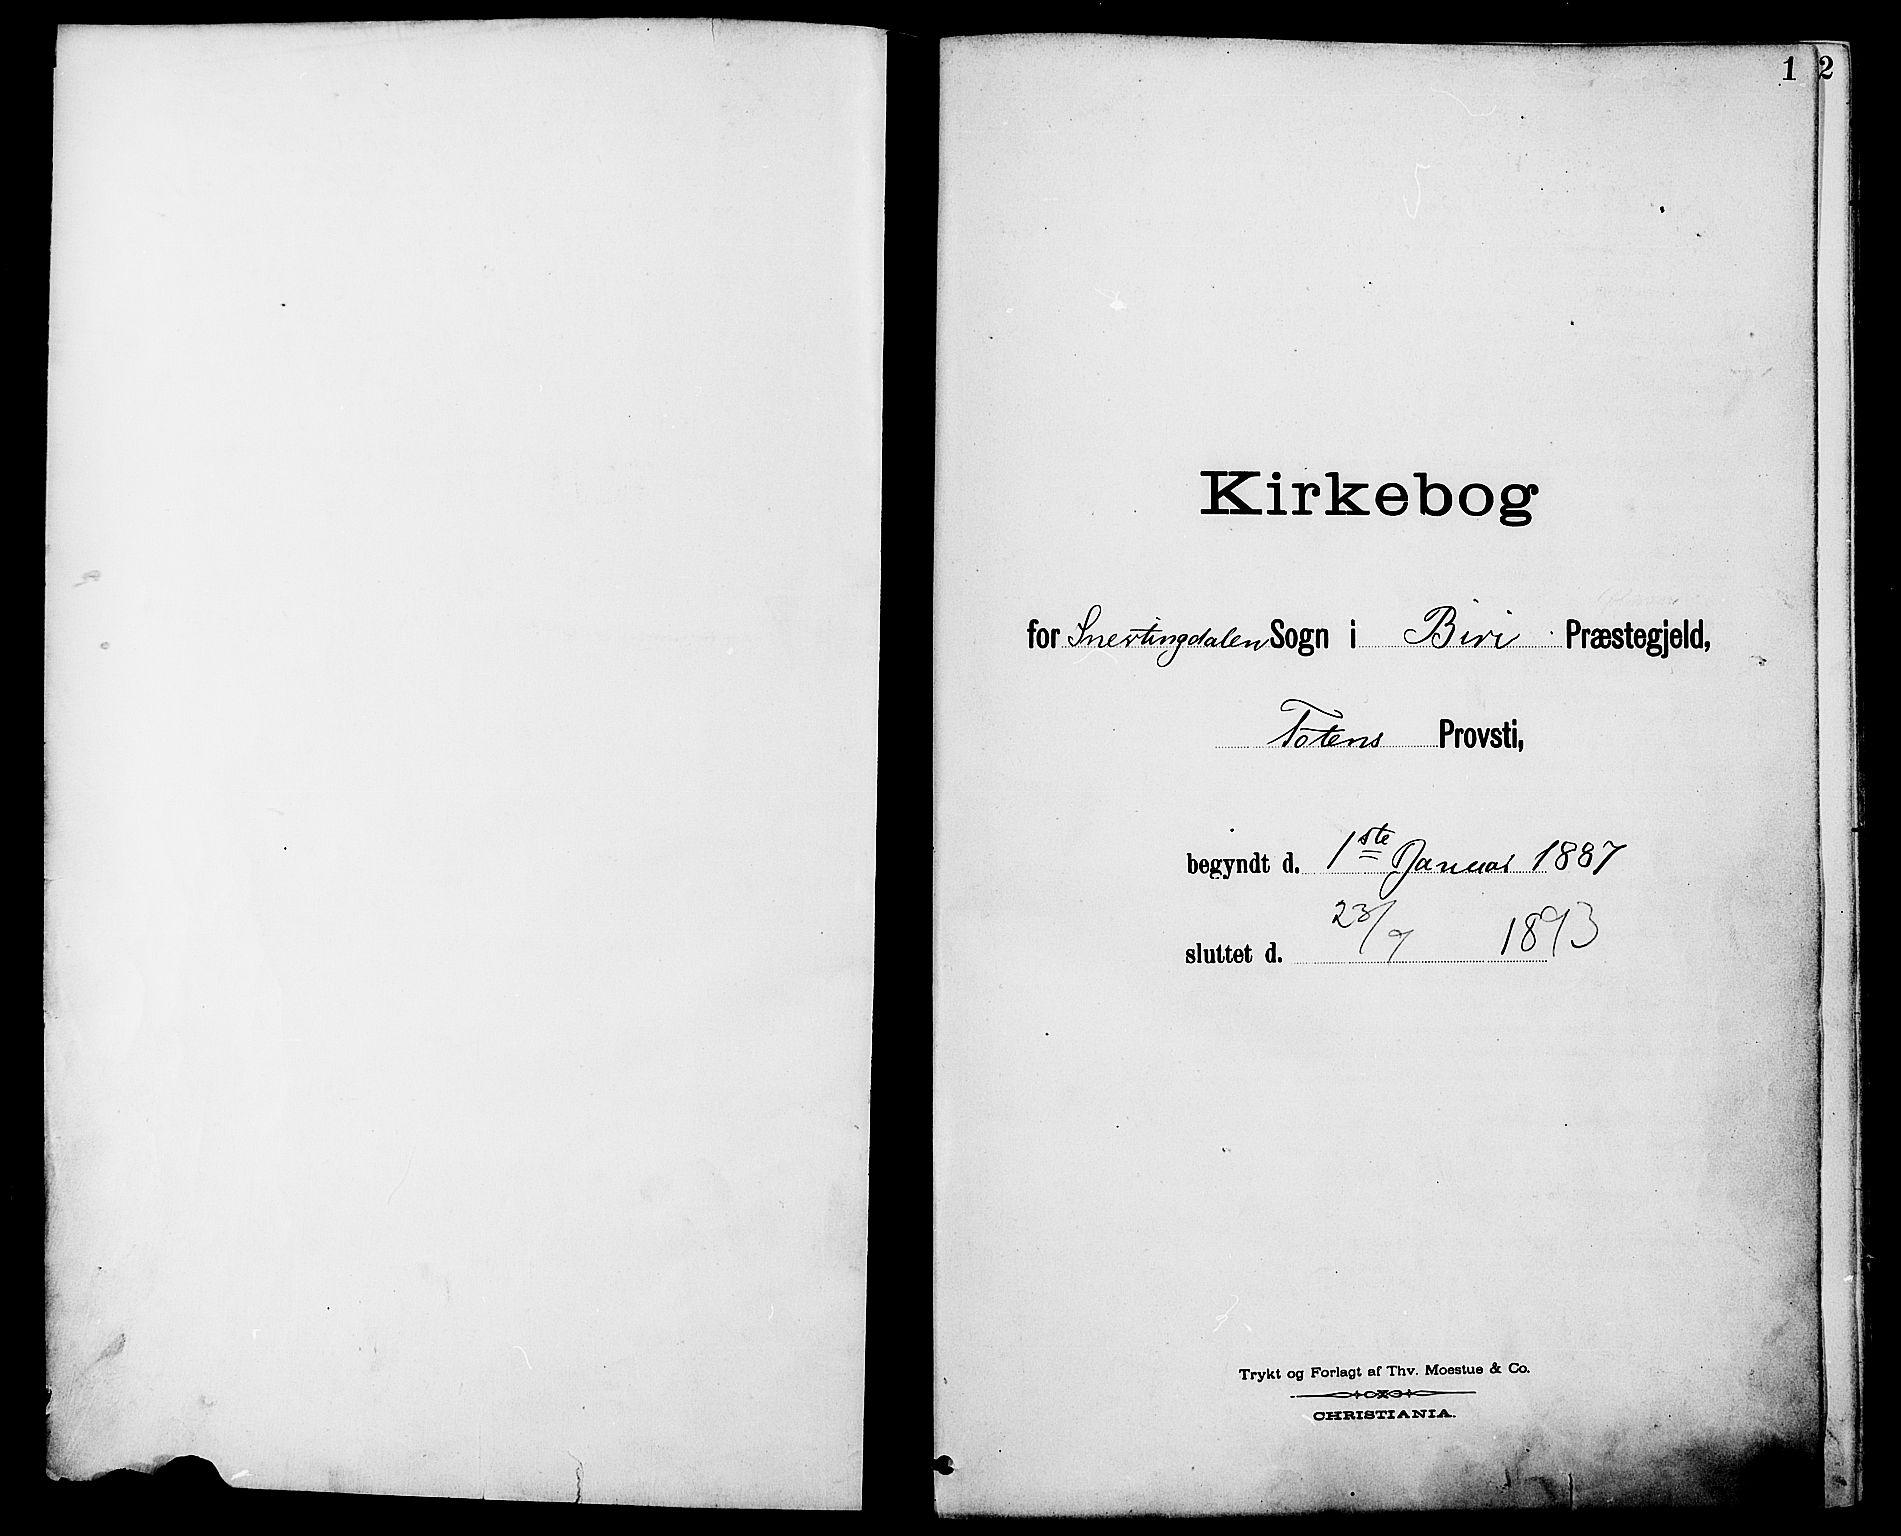 SAH, Biri prestekontor, Ministerialbok nr. 7, 1887-1893, s. 1